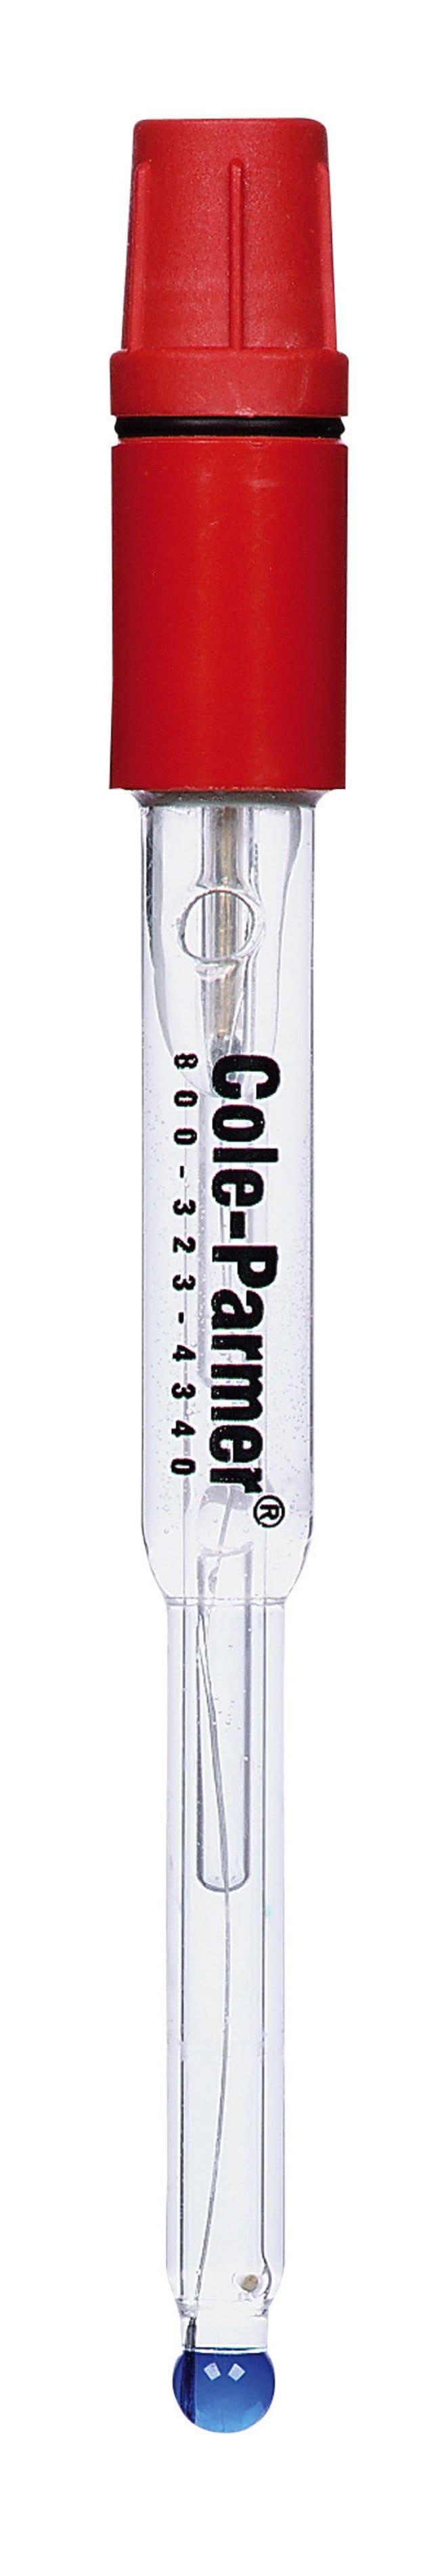 Cole-ParmerCole-Parmer pH electrode, combination, rugged, glass body, interchangeble